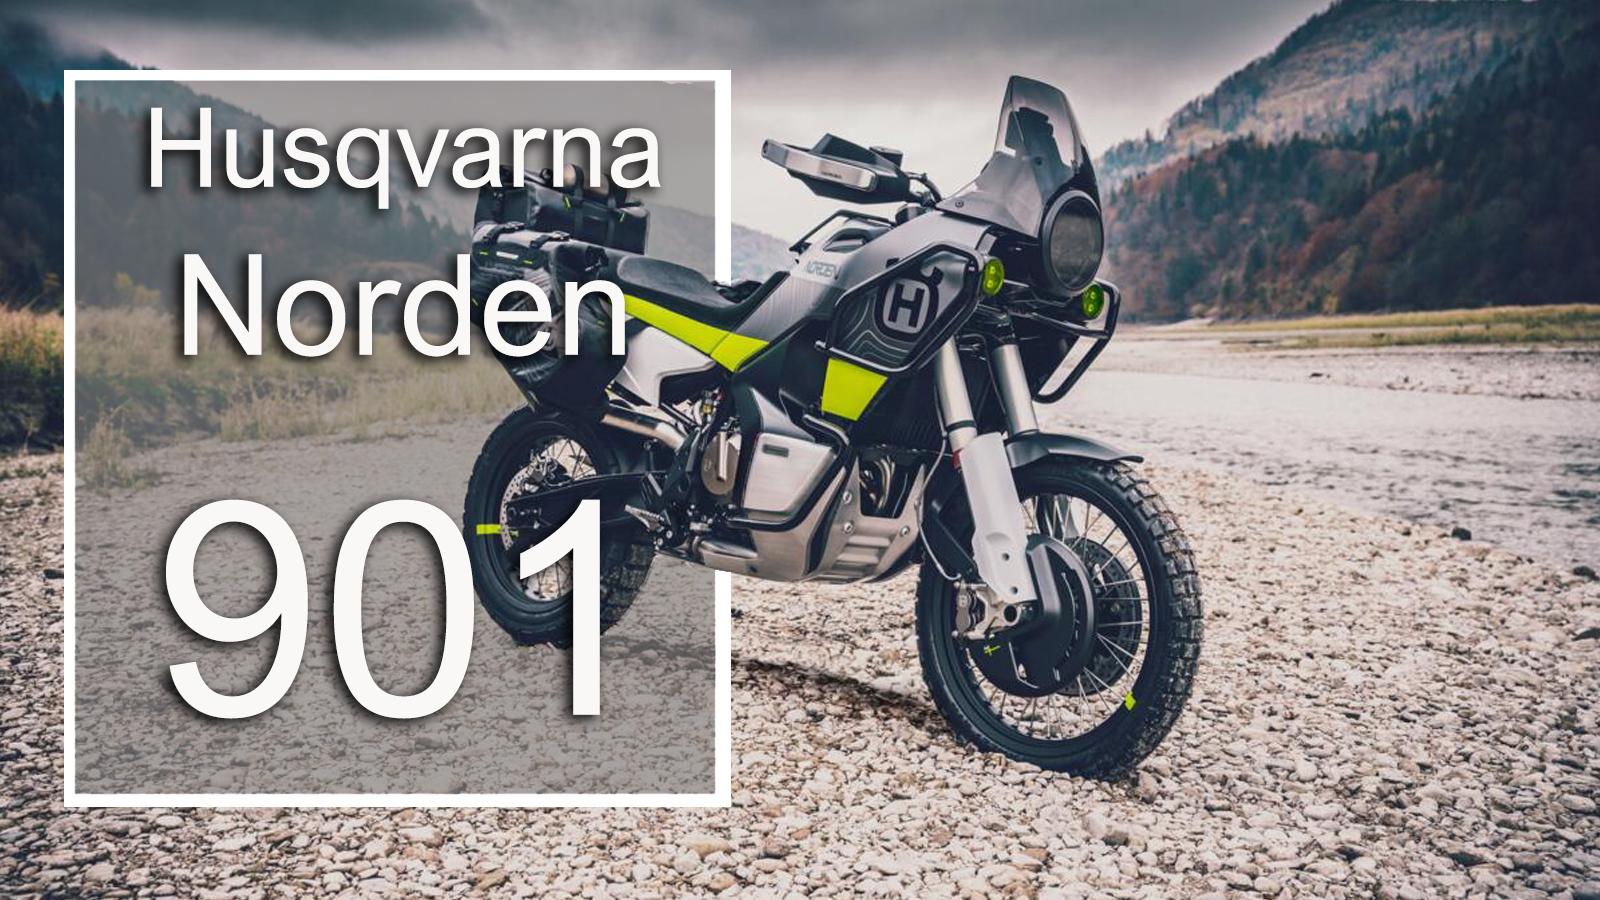 husqvarna-norden-901 cover